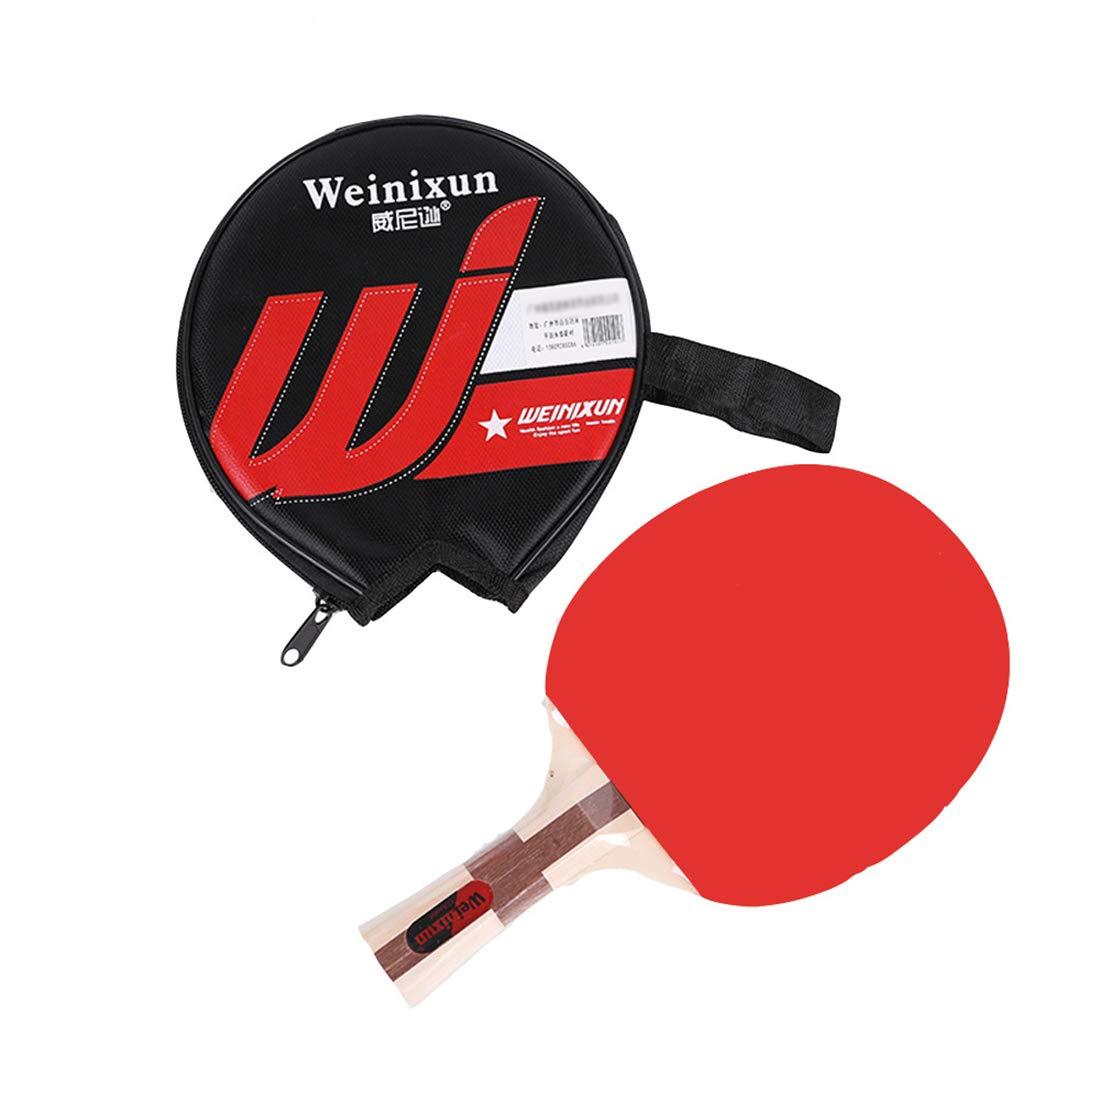 KUANDARPP Ping Pong Pala De Ping Pong Juego De Tenis De Mesa para ...